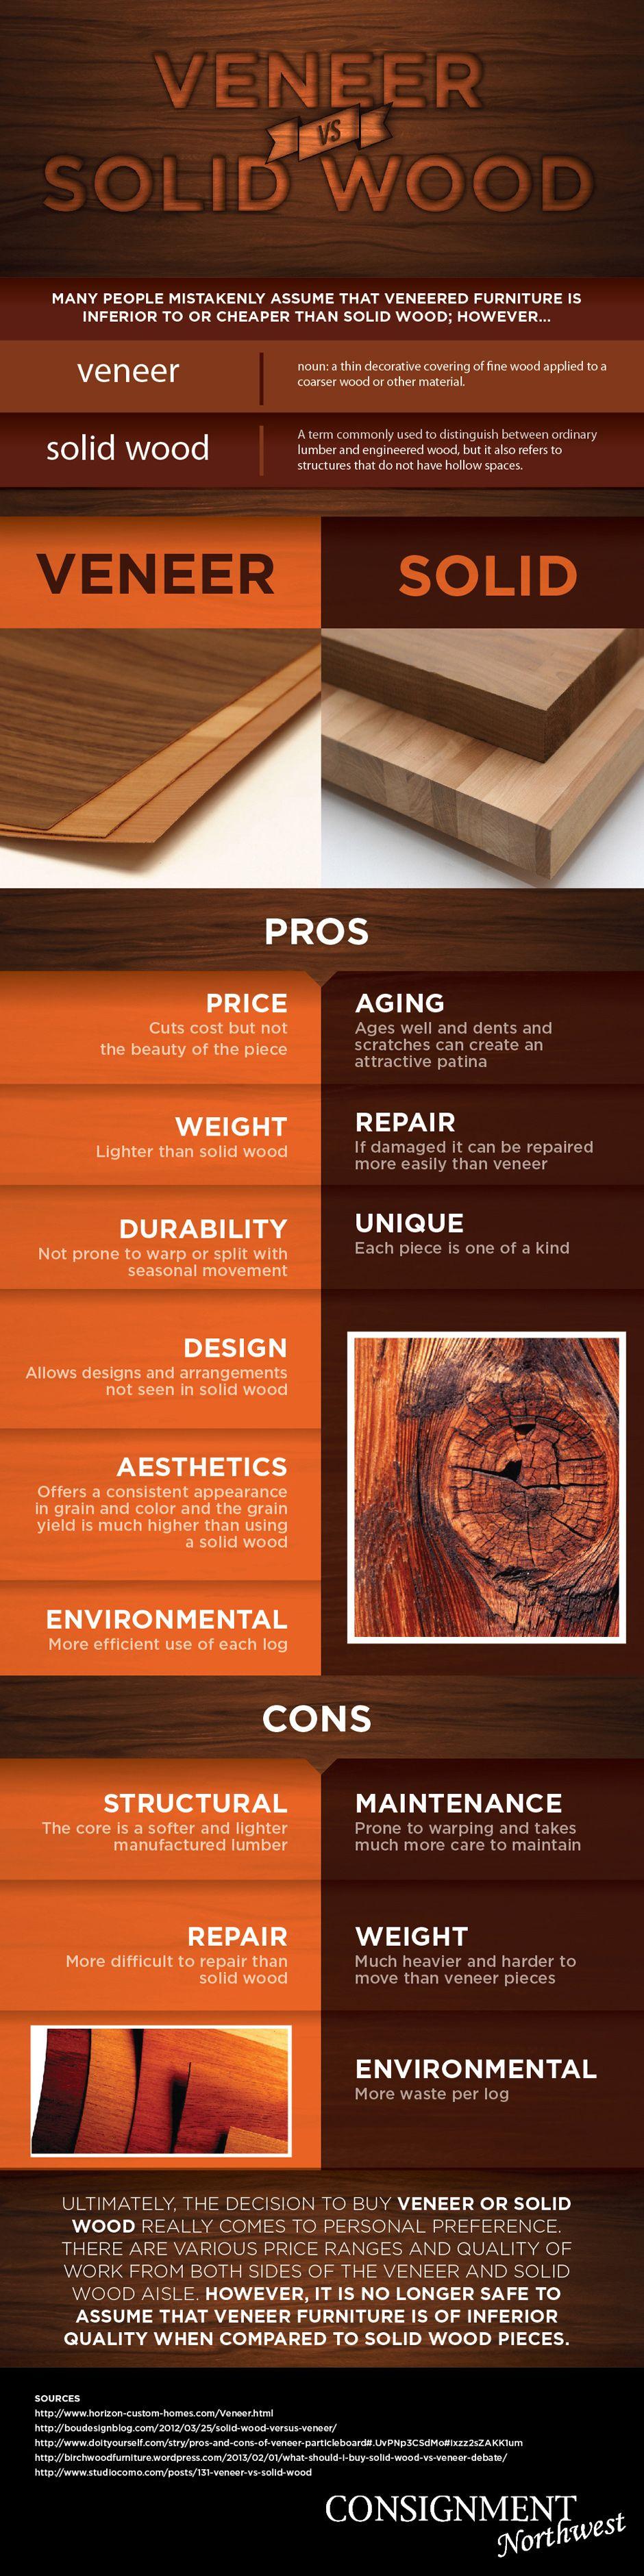 Veneer Vs Solid Wood Furniture Infographic Veneers Teak Wood Furniture Wood Furniture